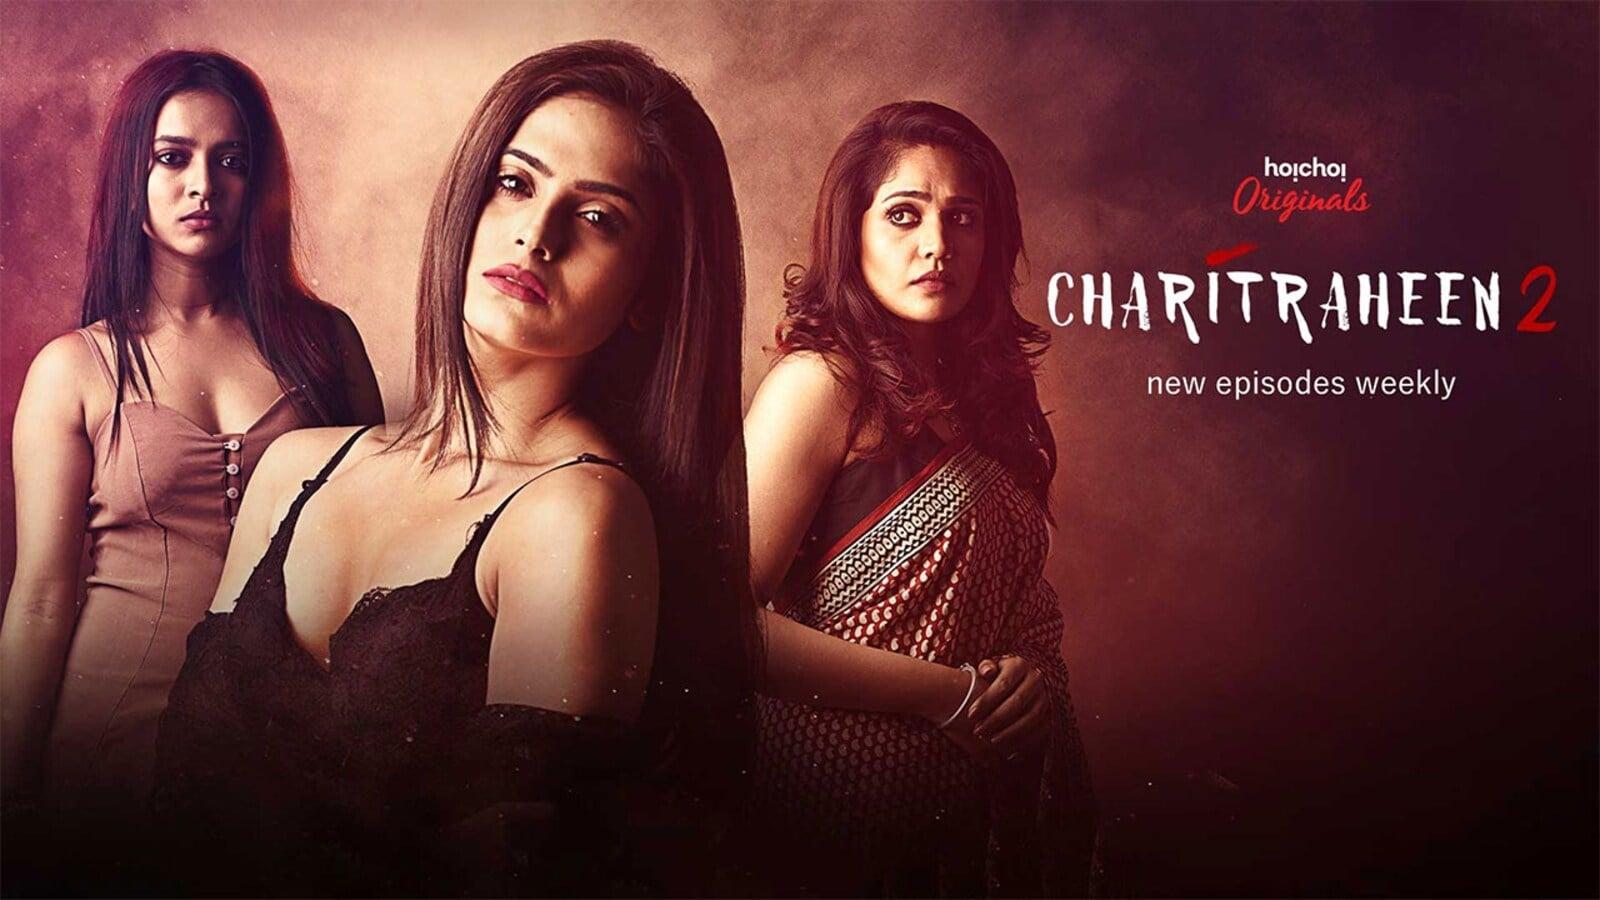 Charitraheen - 7starhd